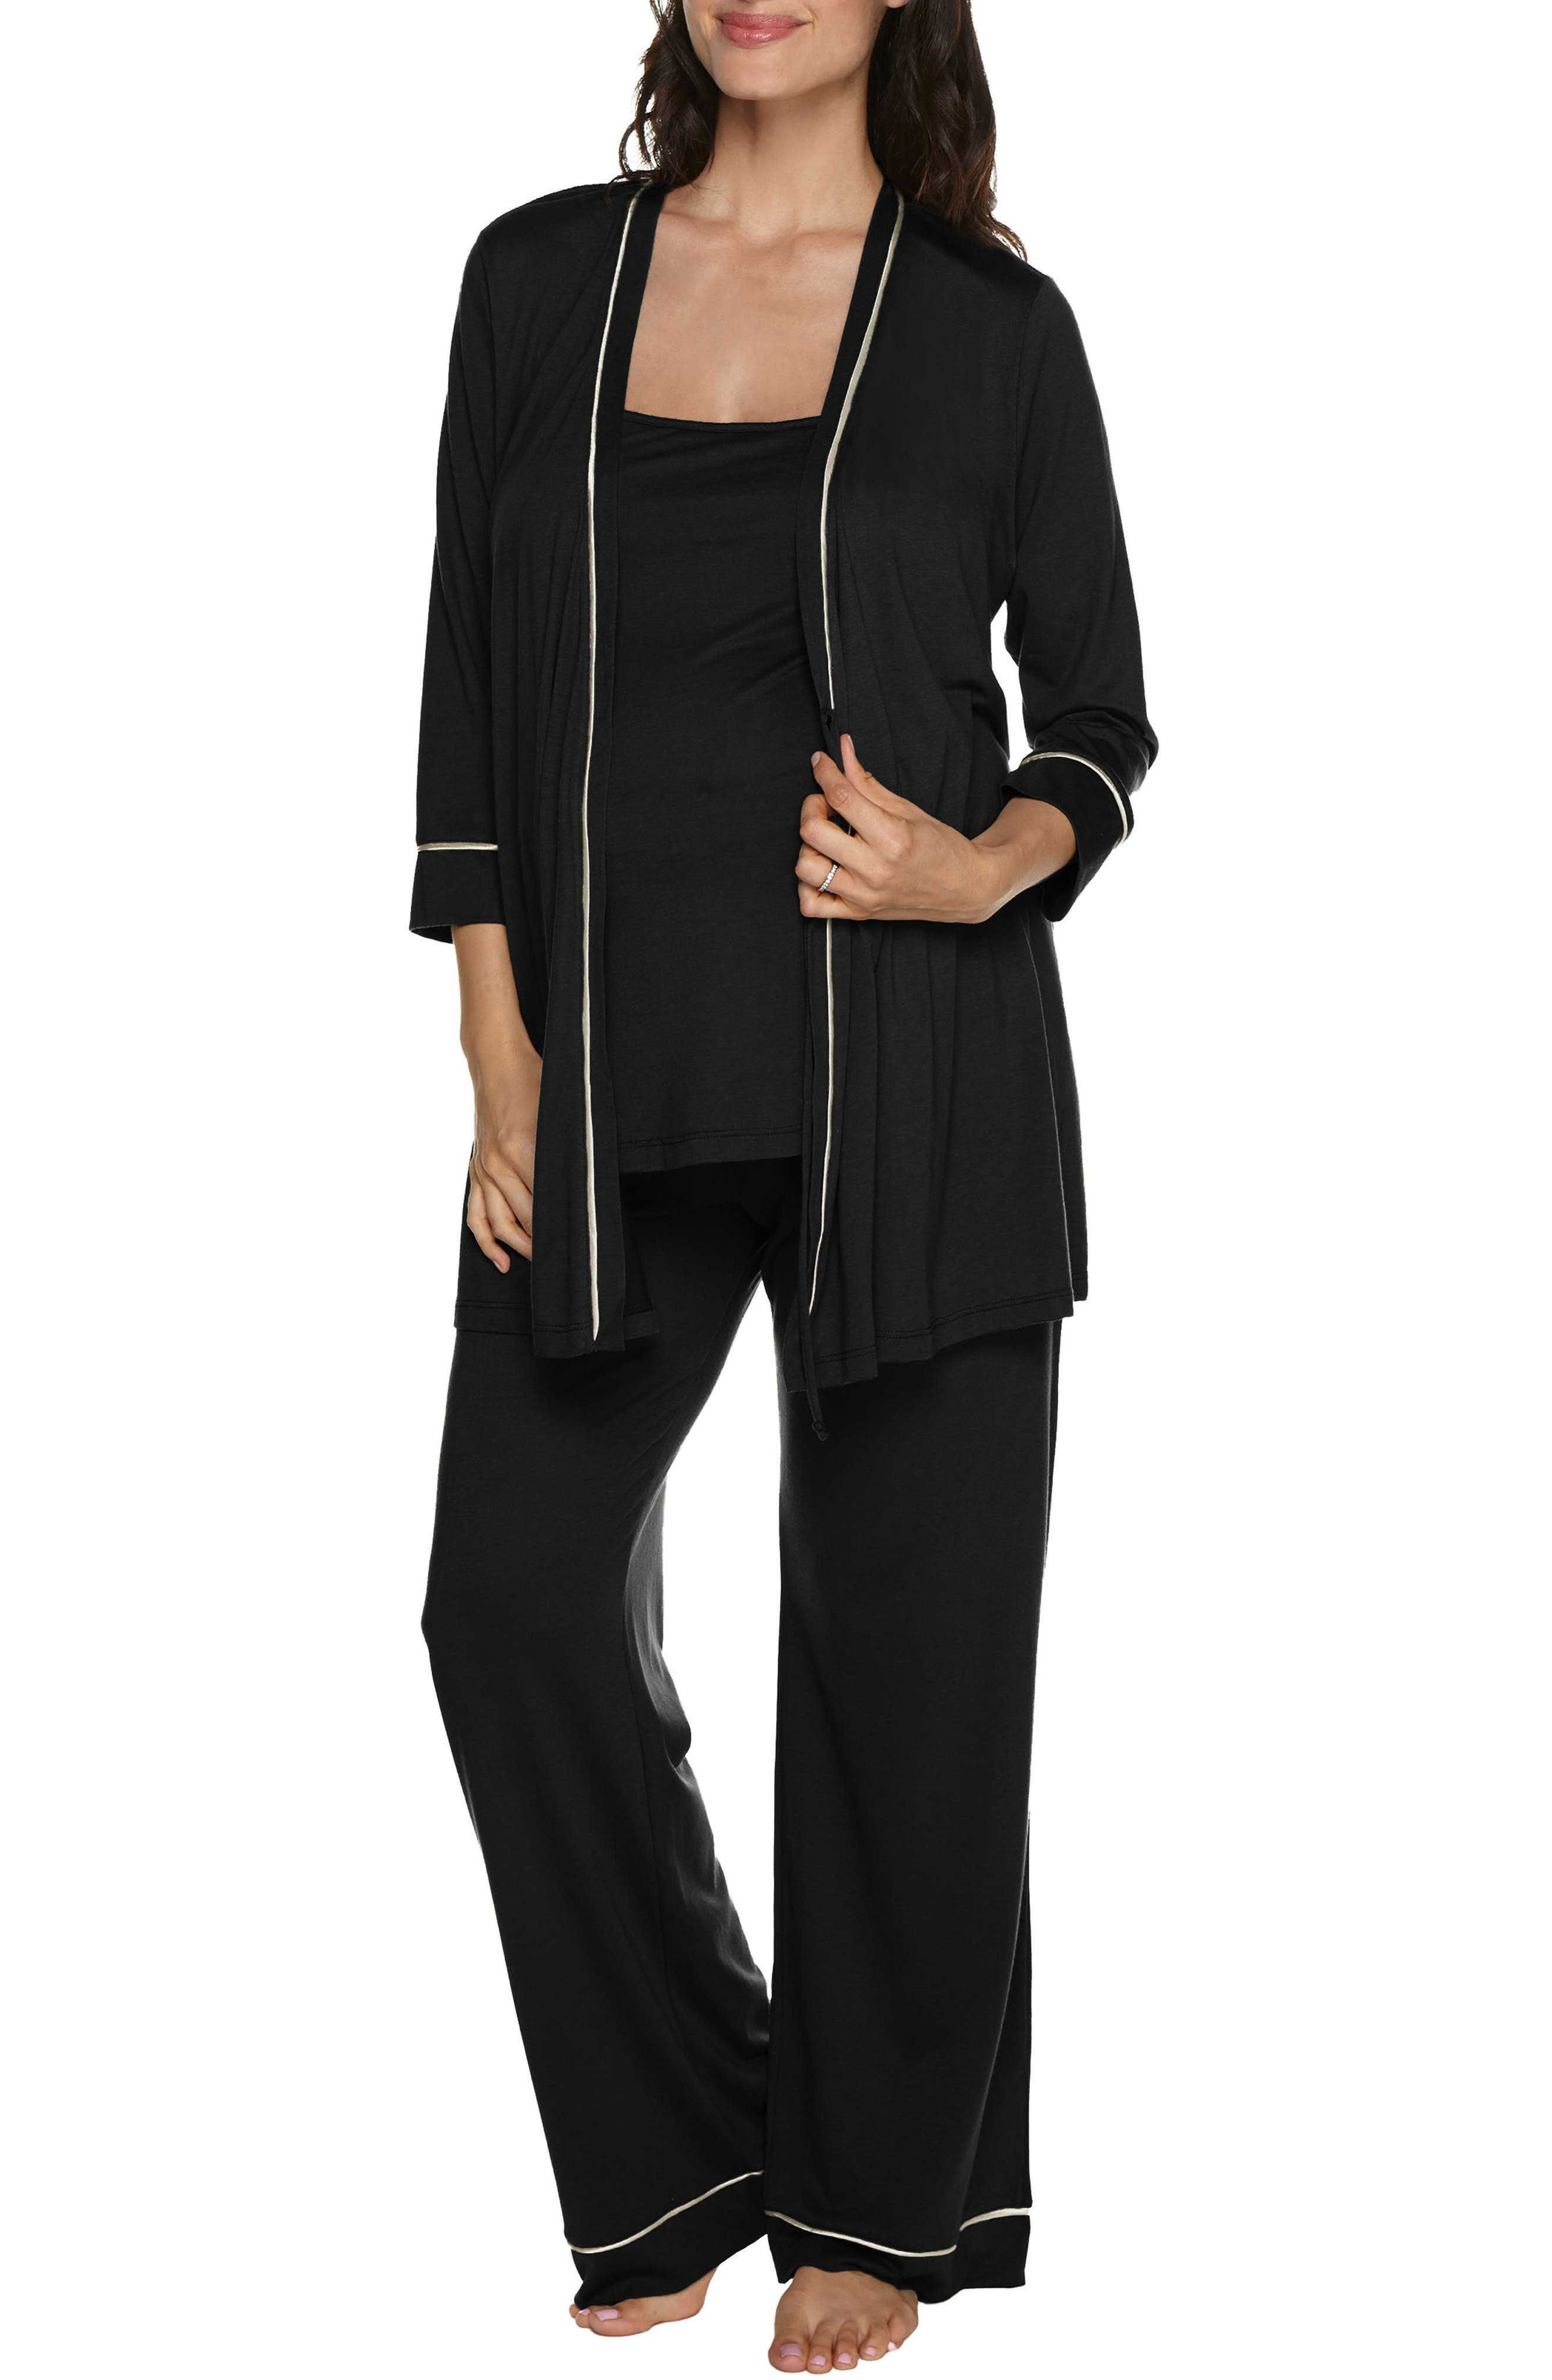 Bella 3-Piece Maternity Pajamas,                         Main,                         color, BLACK/ IVORY